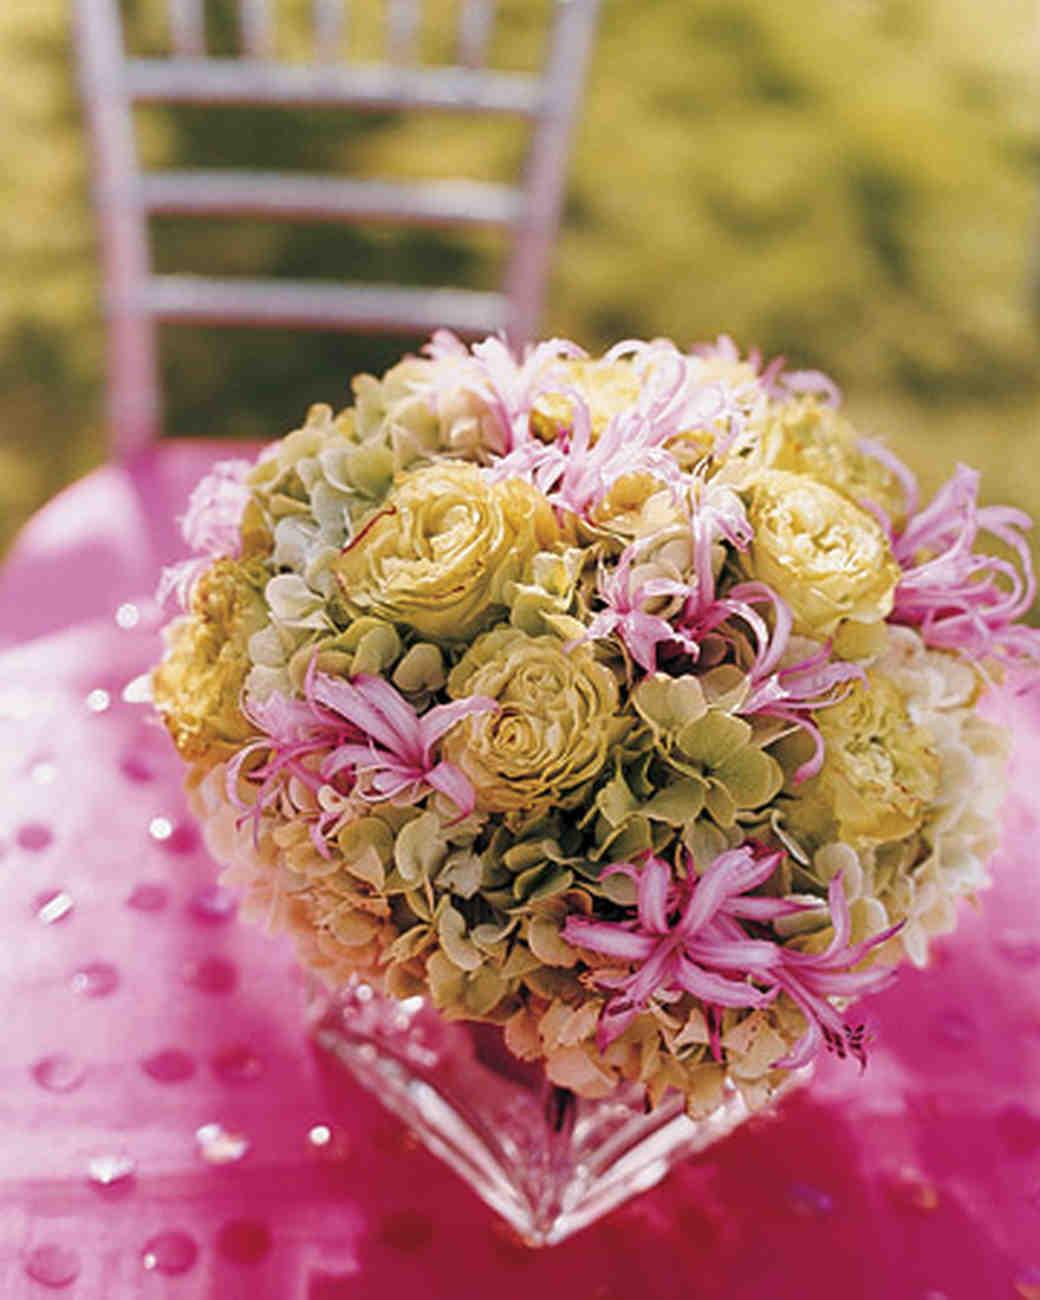 Pink Flower Centerpieces For Weddings: Hydrangea Wedding Centerpieces